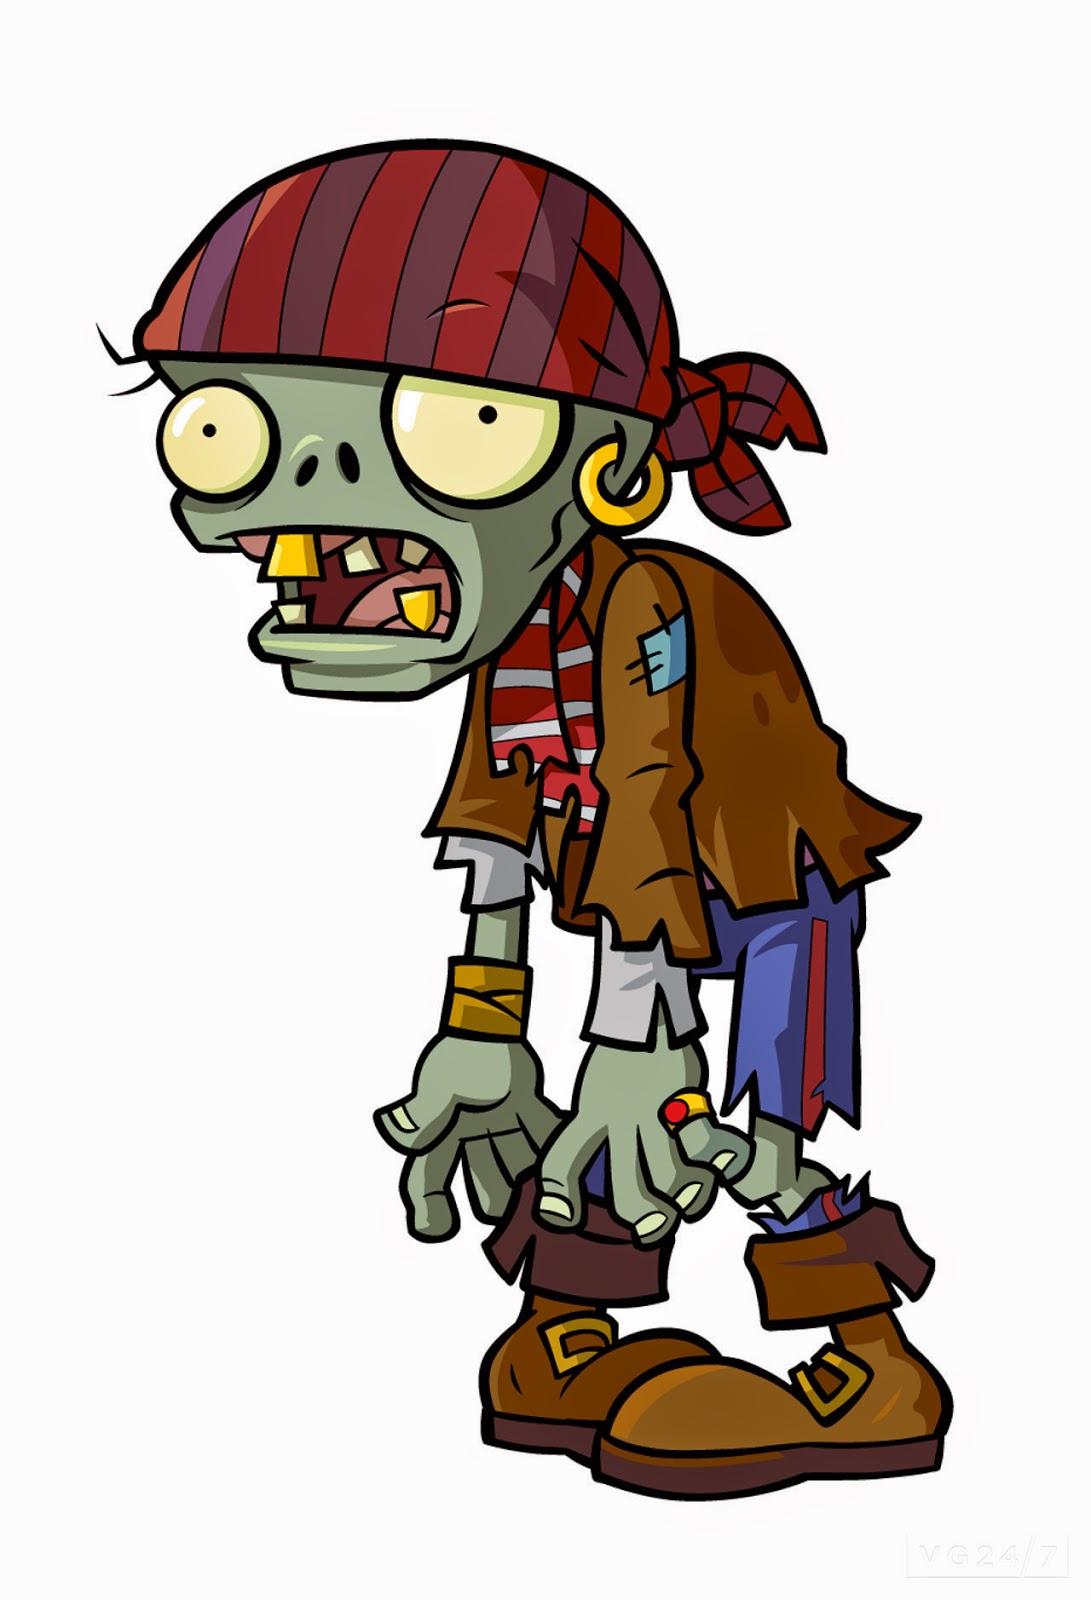 Zombie Lucu Animasi Bergerak Naruto My Interactive Image Thinglink